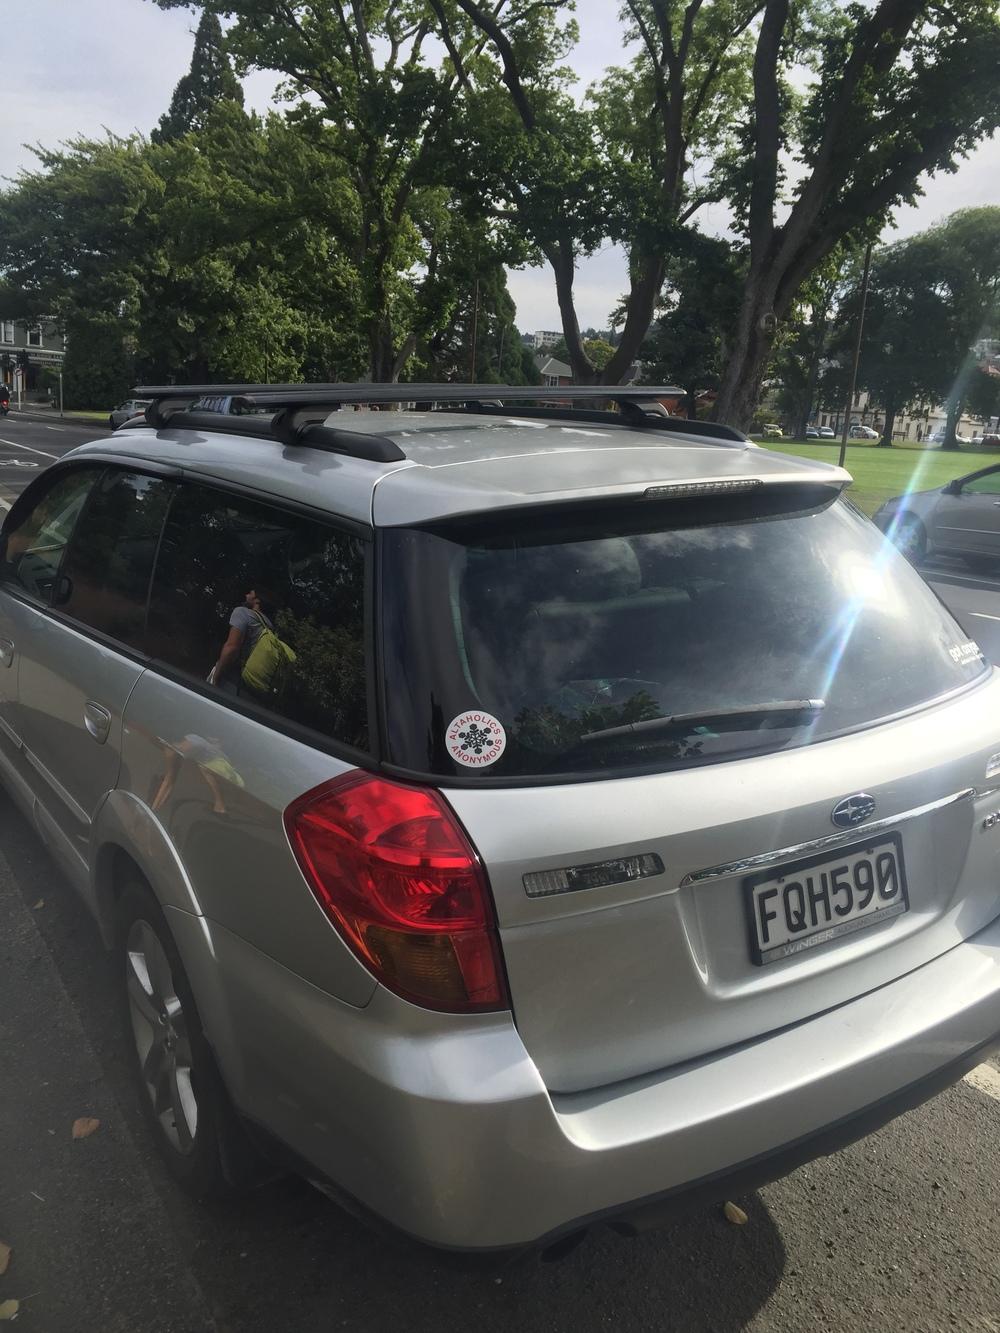 We found an ALTA STICKER on this random Dunedin car. The world is small!!